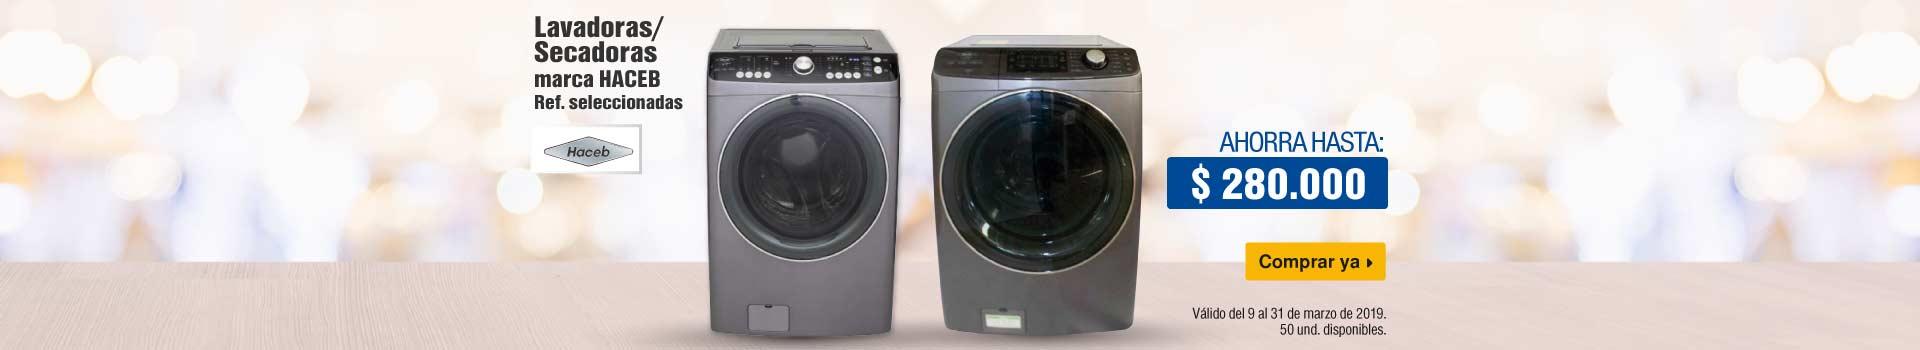 AK-KT-mayores-4-ELECT-BCAT-lavadoras-HACEB-060319